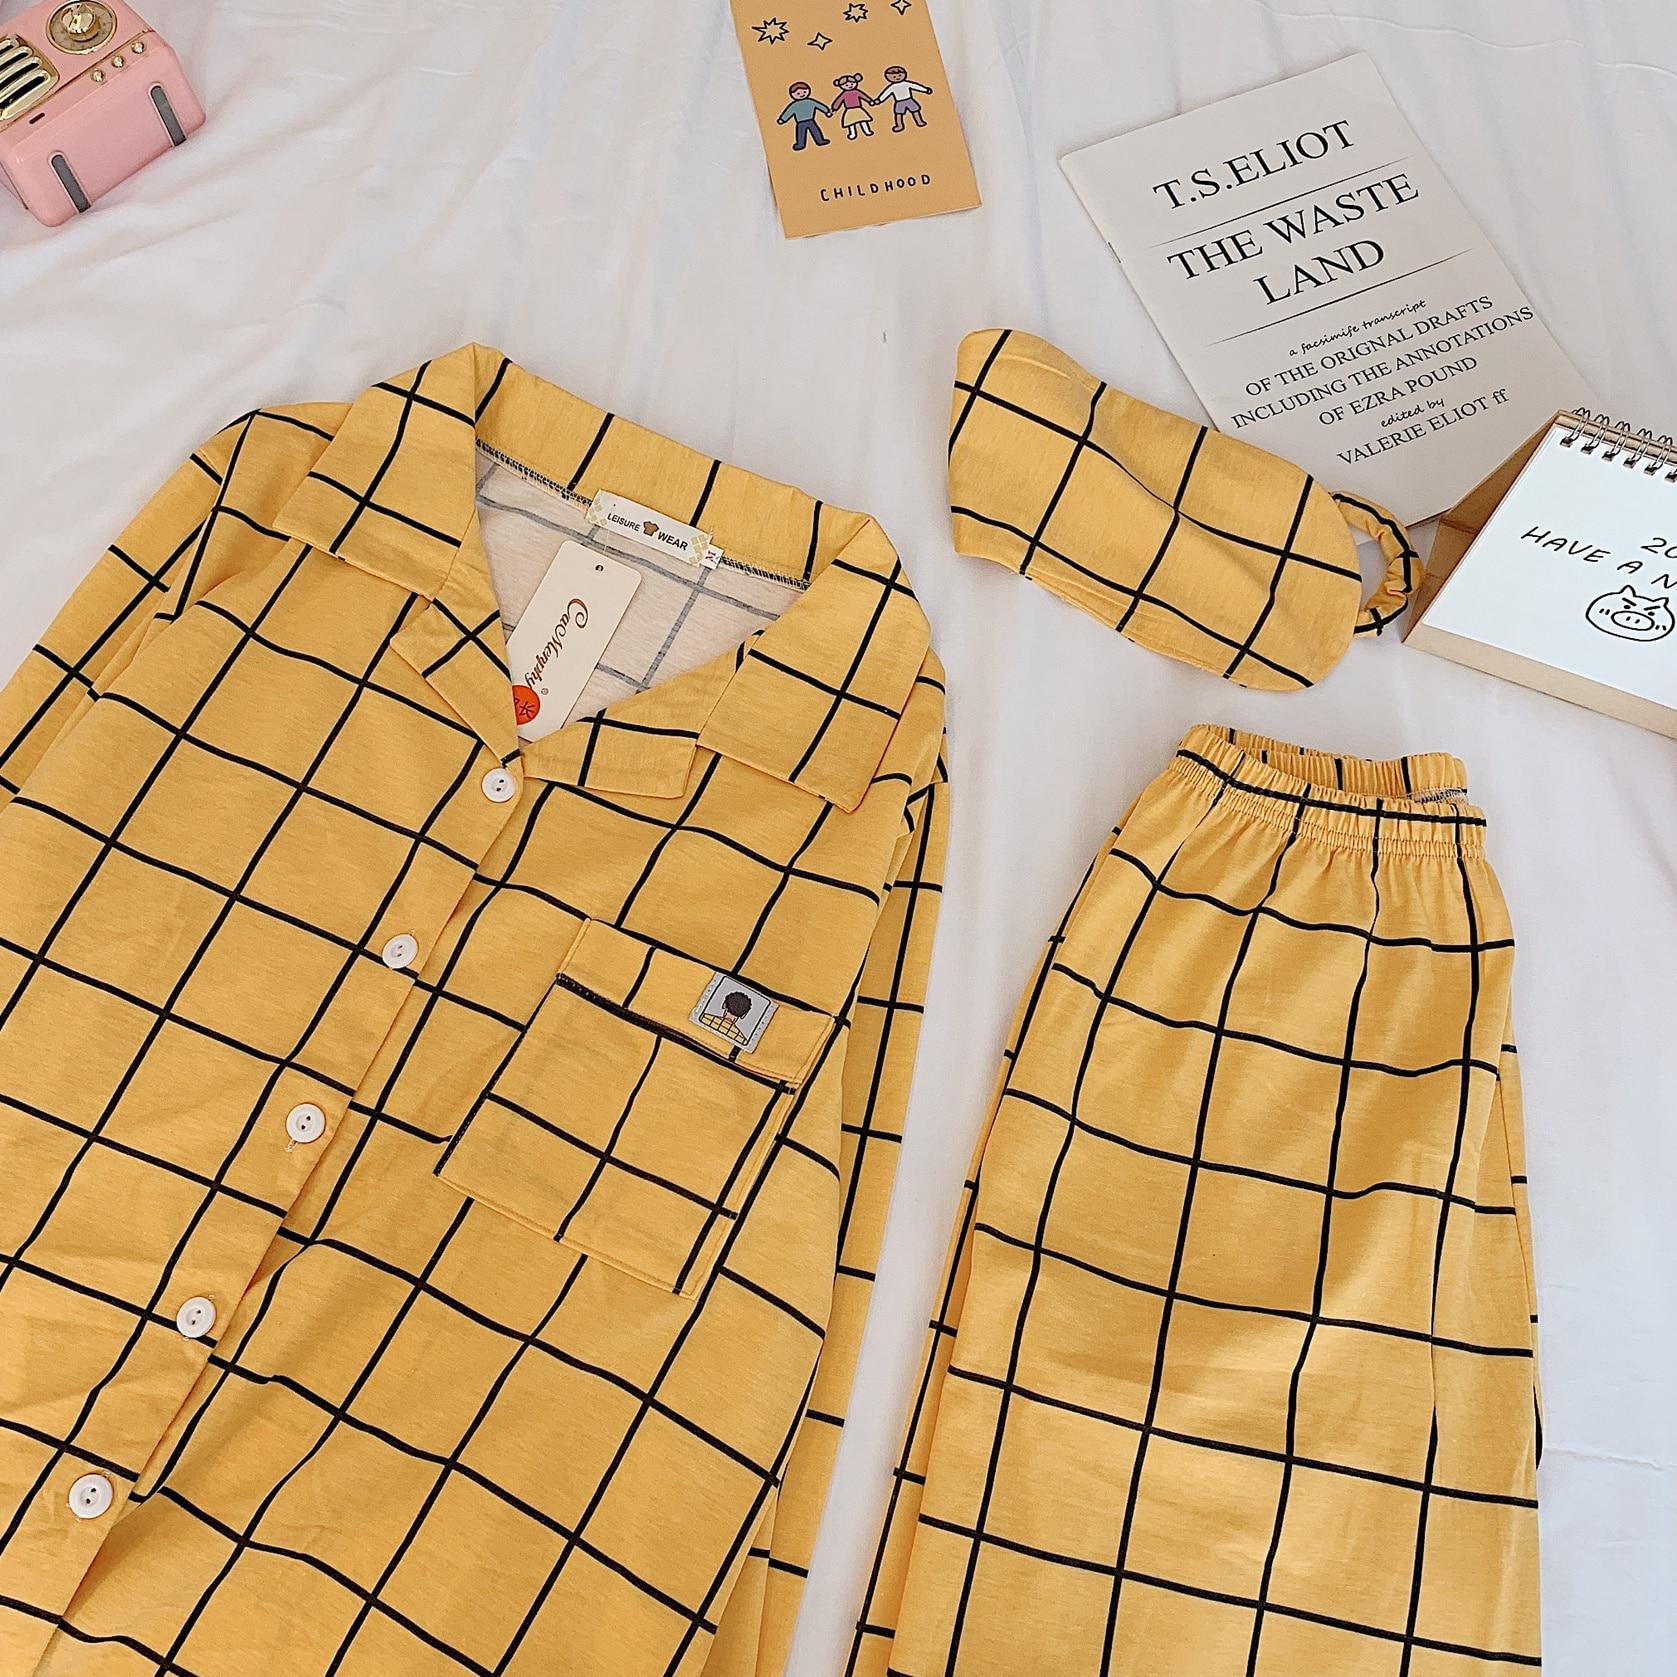 New Kpop Bangtan Boys Cartoon Sleepwear Heart Stripe Print Pajamas Sets Women Harajuku Pajamas Women Shirt Nighty Nightwear Set